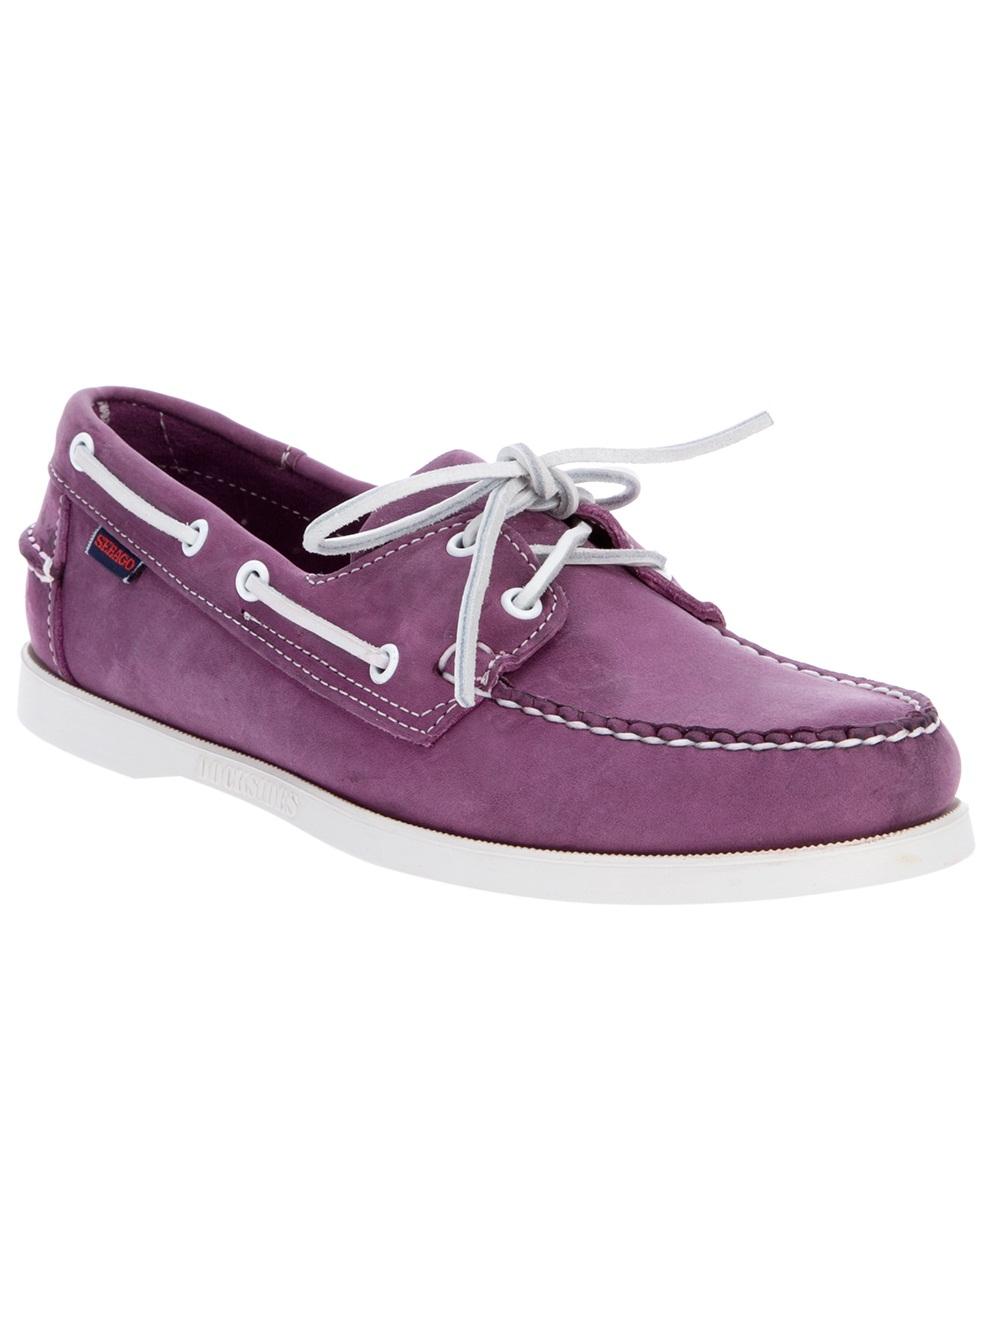 Sebago Docksides Shoe in Lavender (Purple) for Men